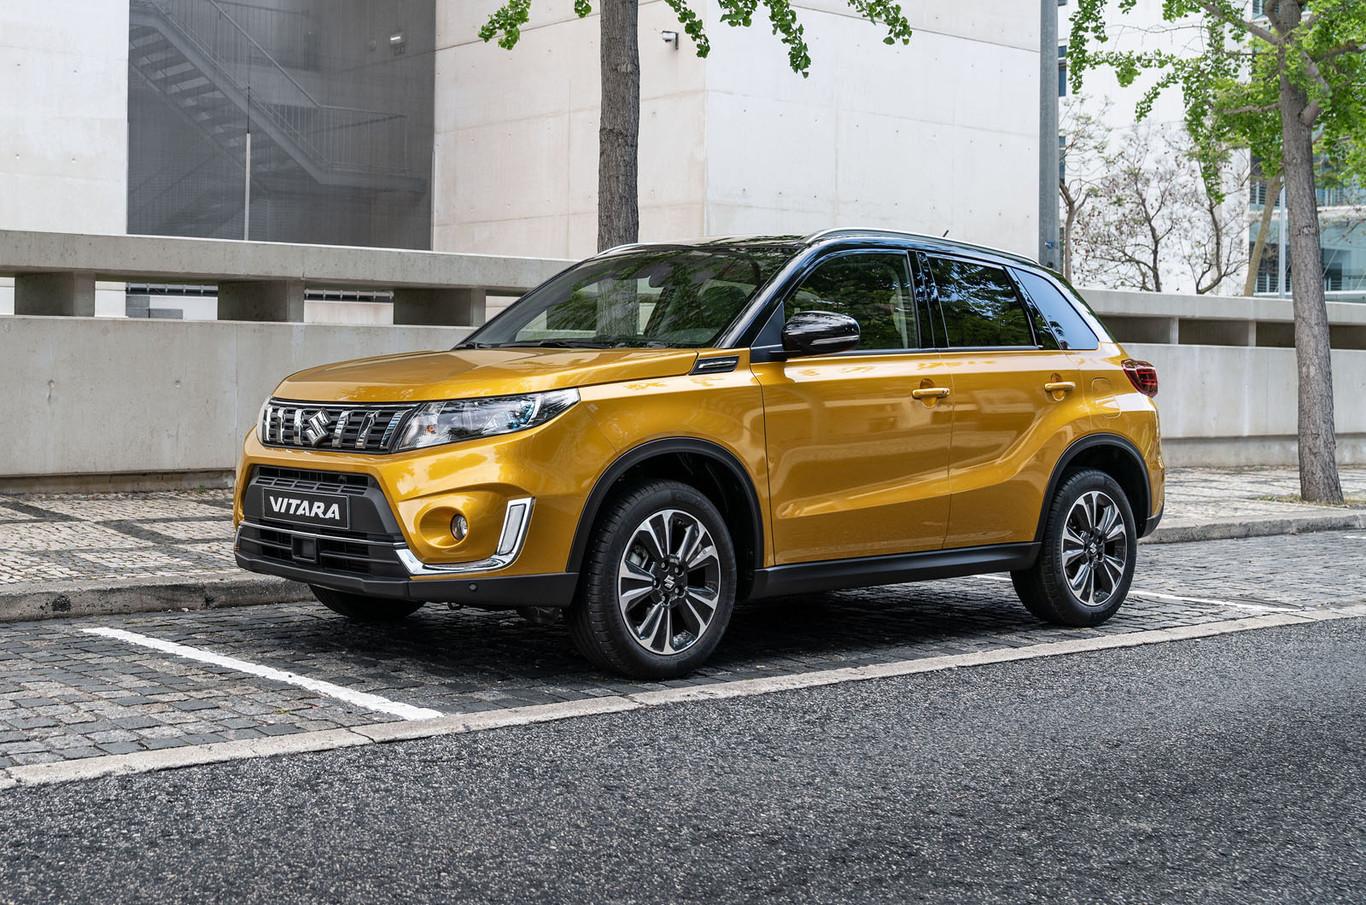 2021 Suzuki Grand Vitara Review